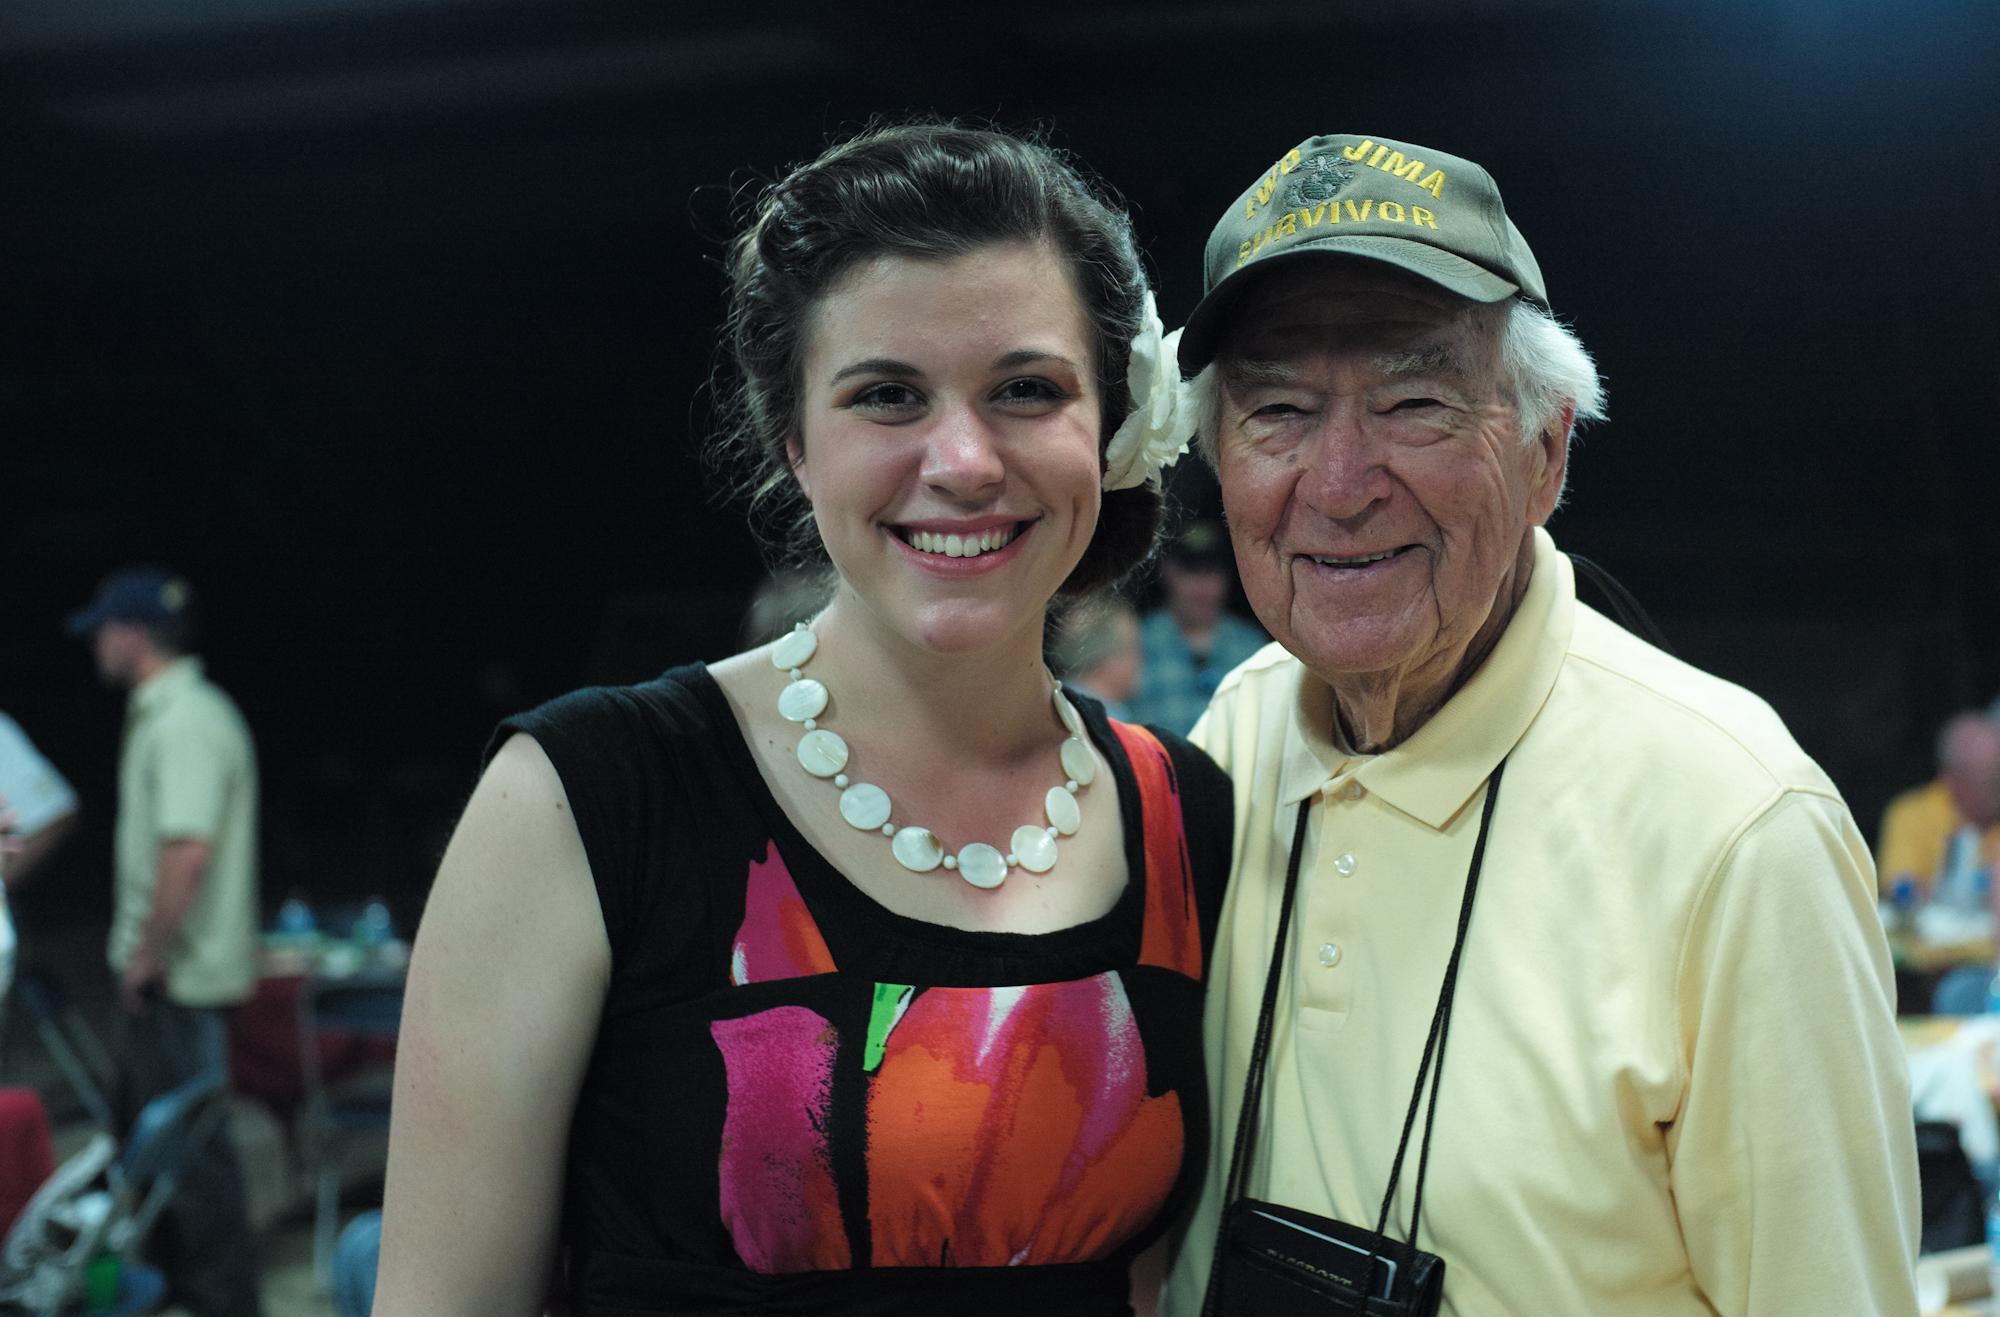 Iwo Jima and Korean War veteran, Norman Baker